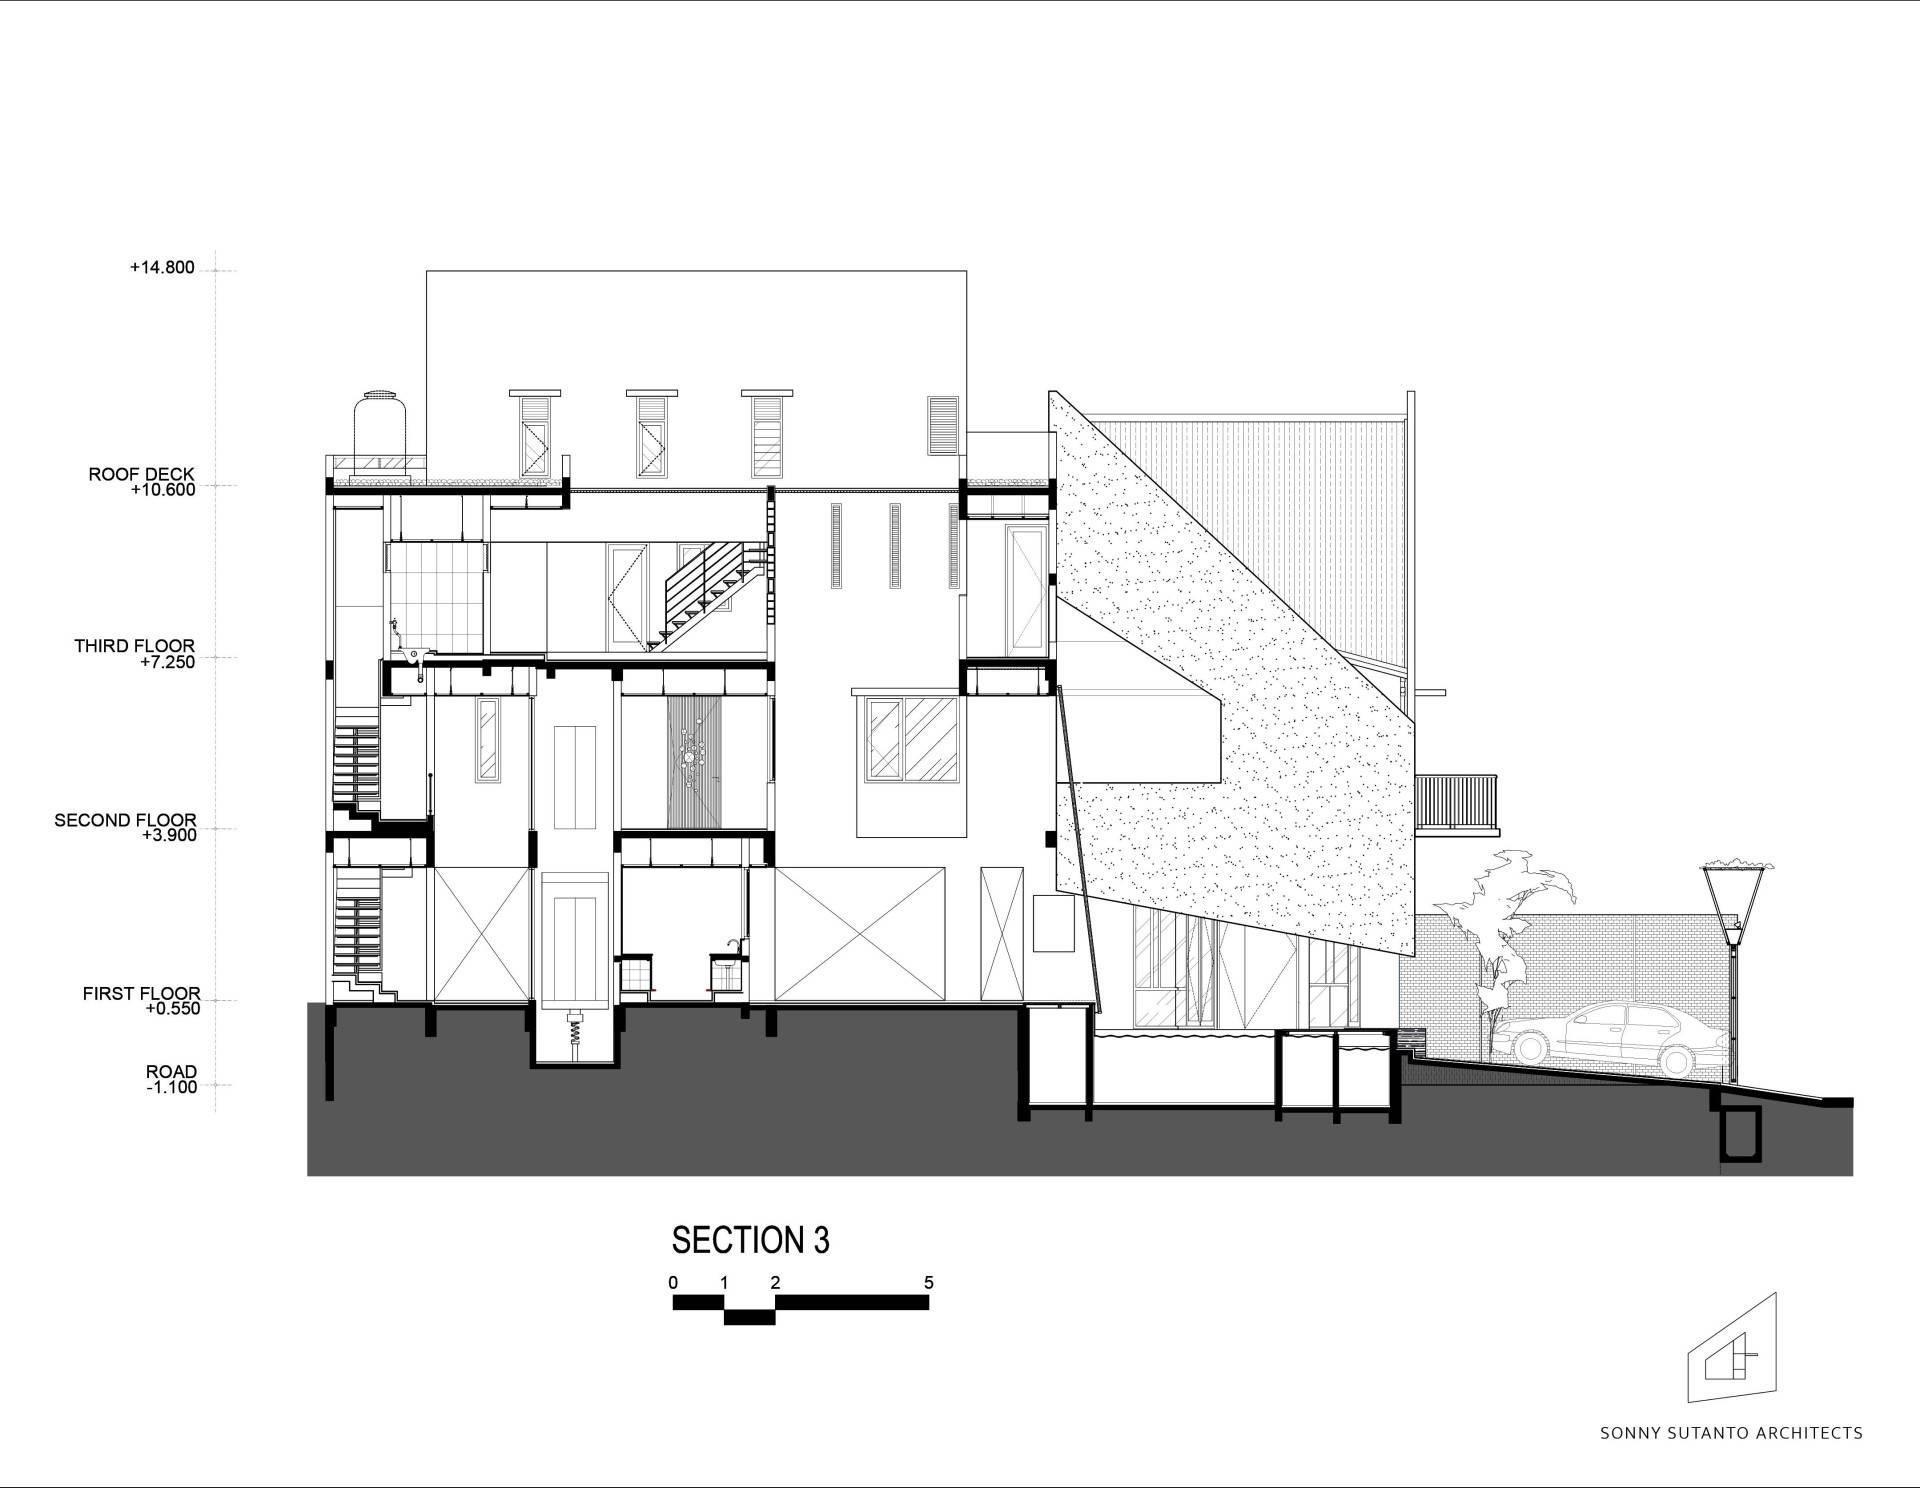 Sonny Sutanto Architects Sonny Sutanto Architects New Office Sunter, North Jakarta, Indonesia Sunter, North Jakarta, Indonesia Masterplan Section 3   2094